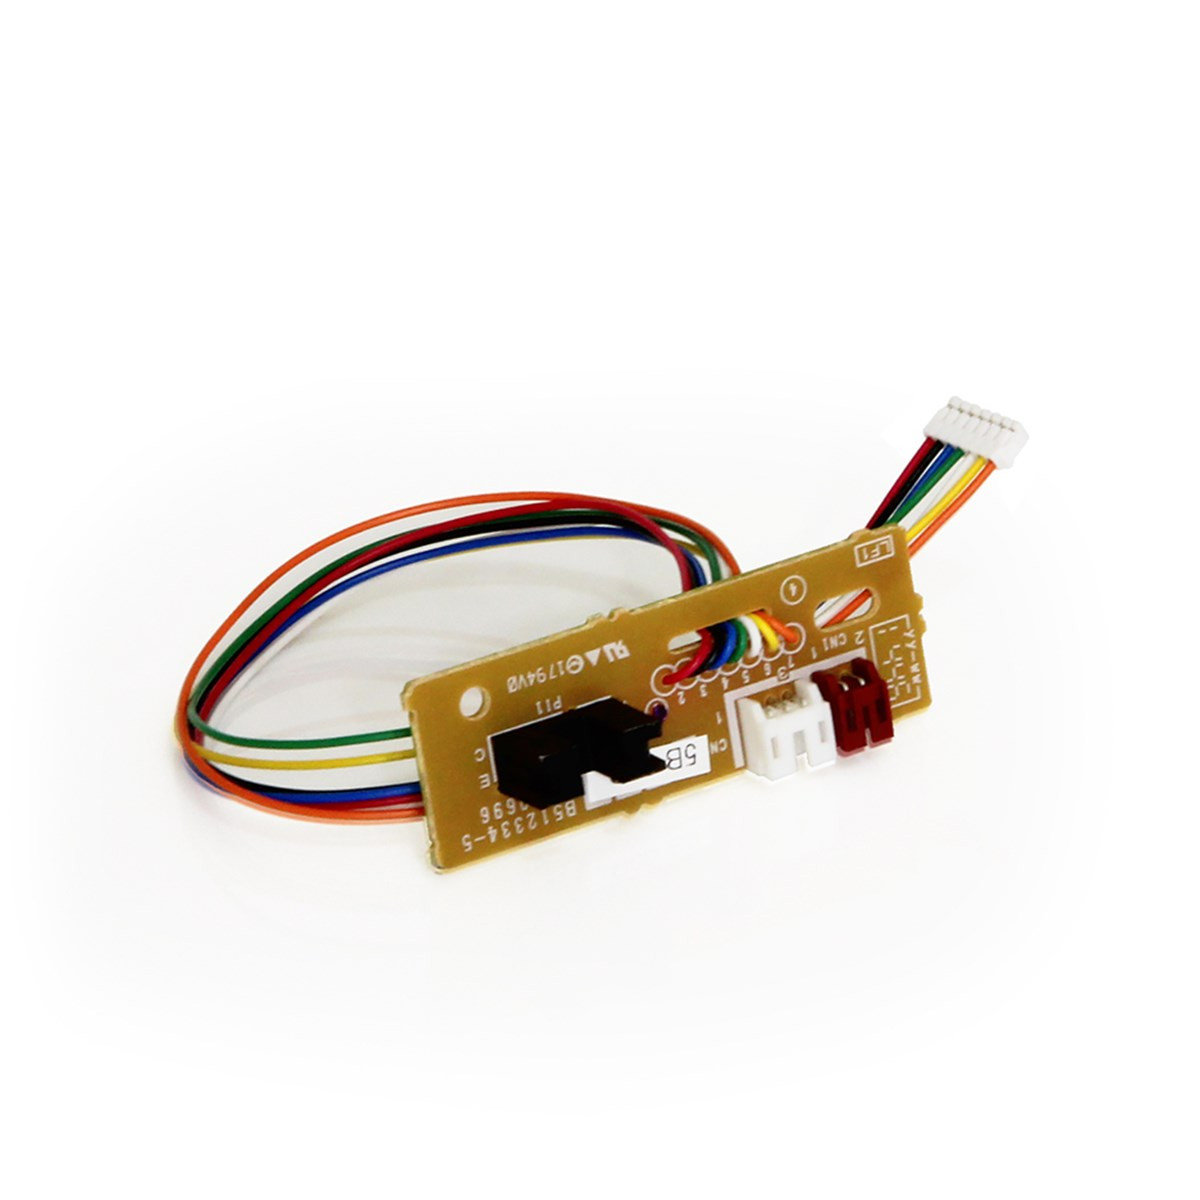 Placa Conectora do Fusor Brother DCP-8112DN HL-5452DN DCP-8152DN DCP-8157DN MFC-8952DW | Original